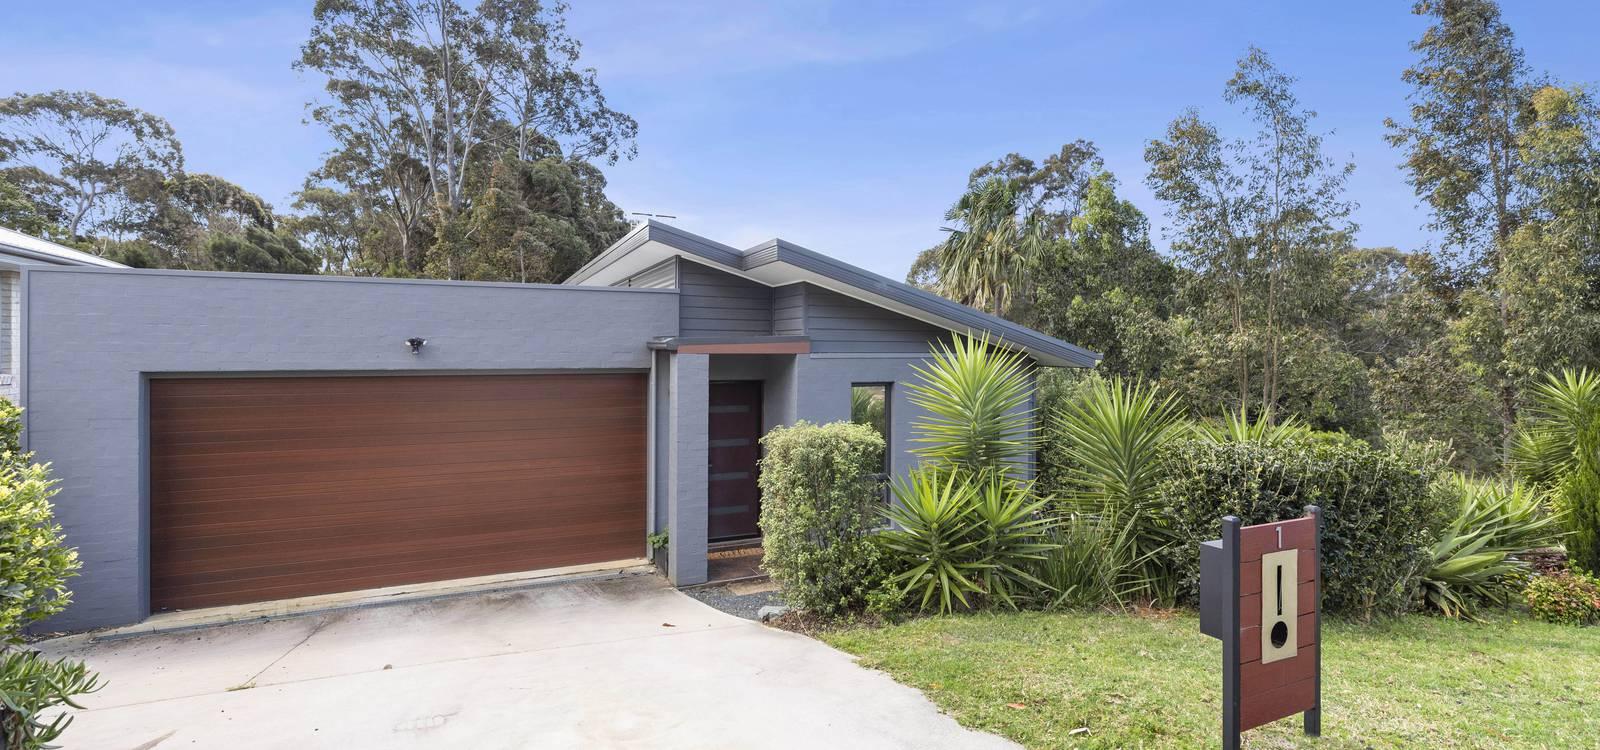 1 Litchfield Crescent LONG BEACH, NSW 2536 - photo 1